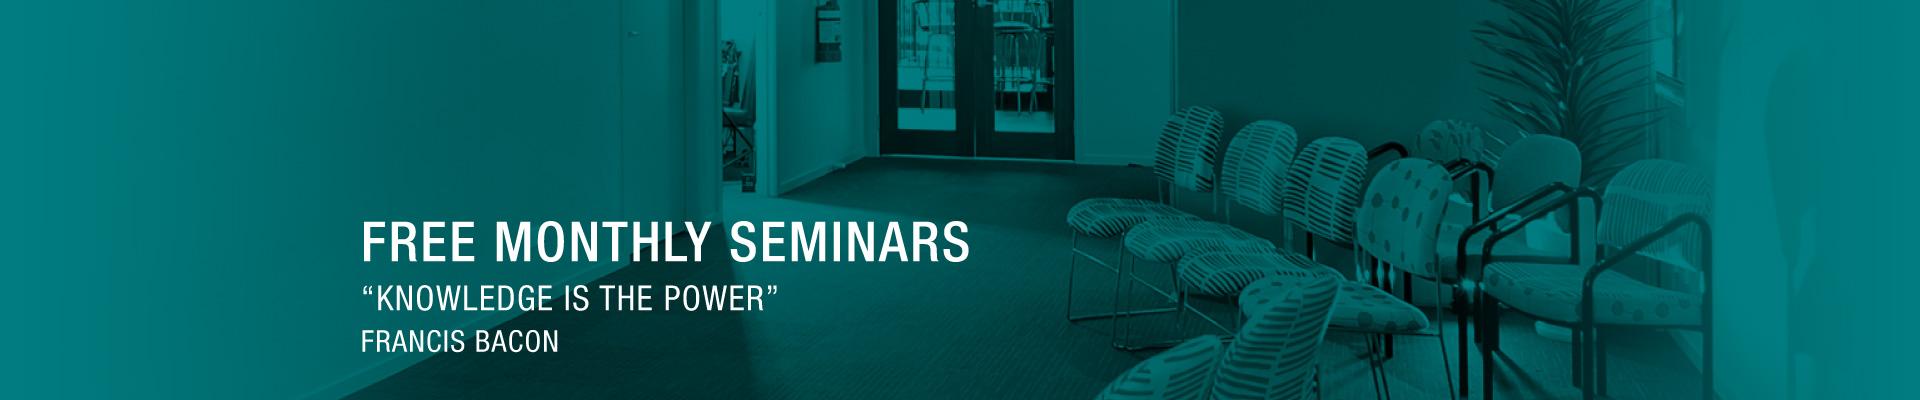 banner_seminars-1